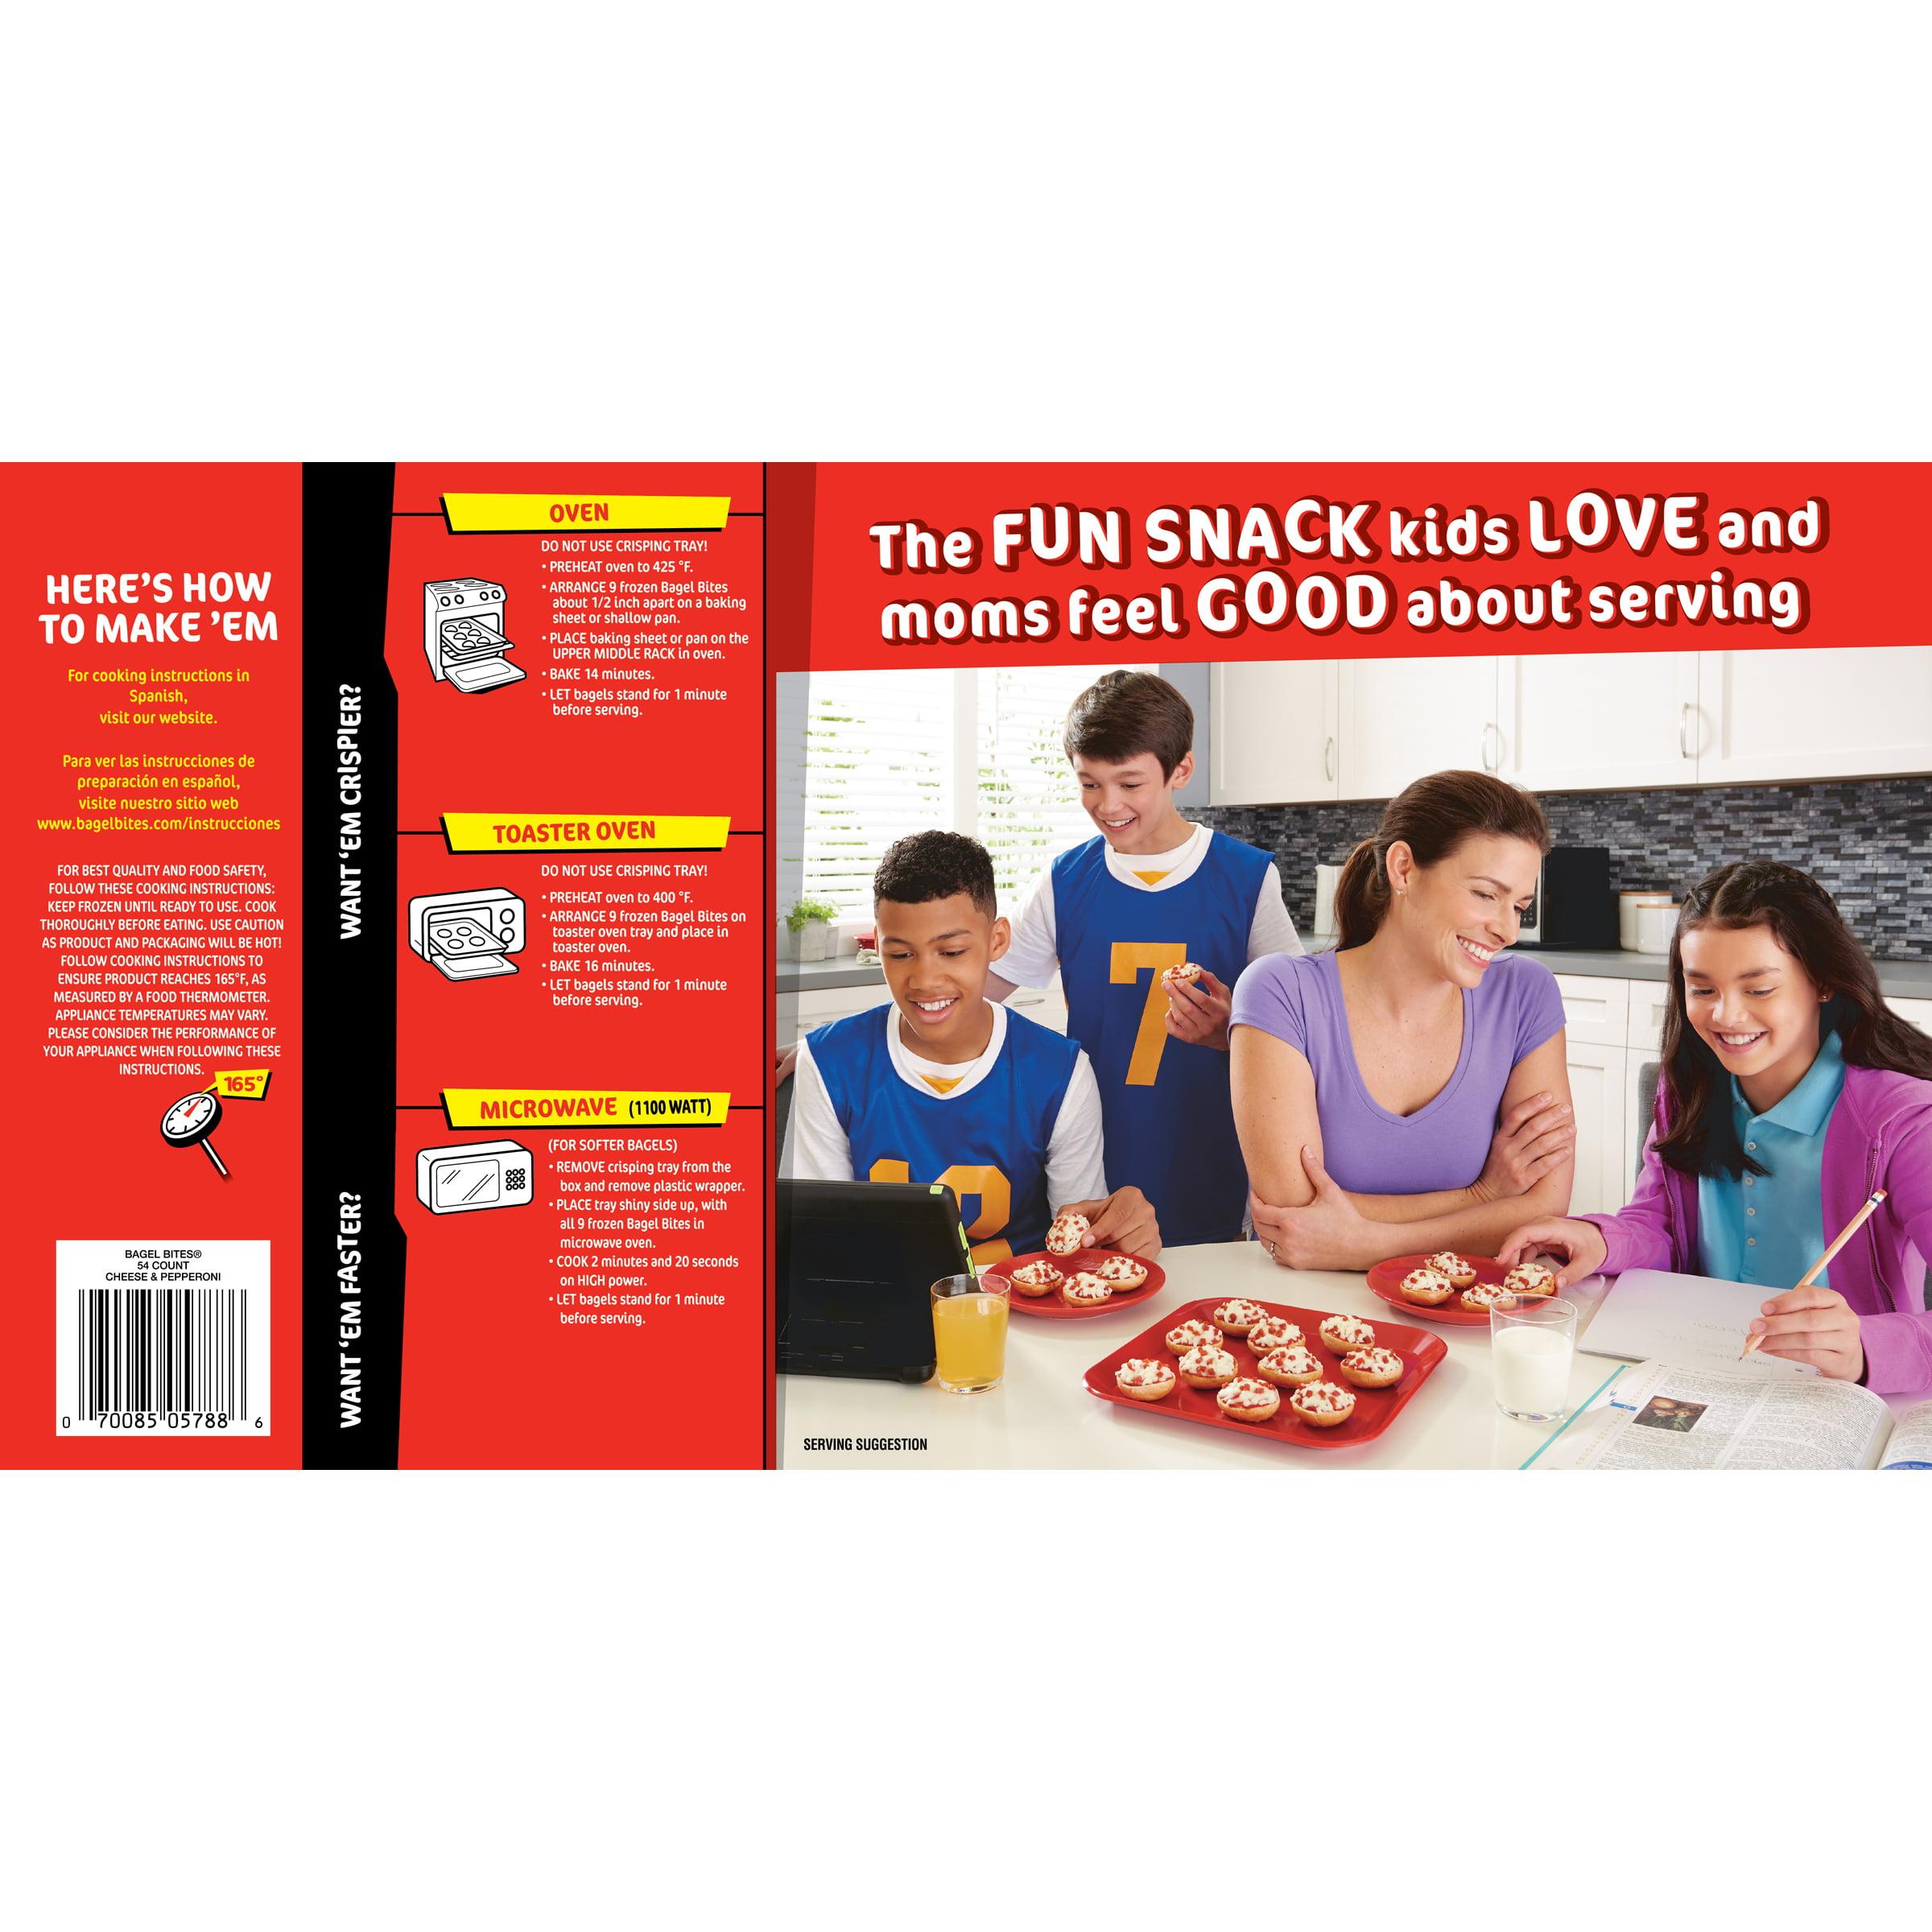 Pizza Bagel Bites Microwave Instructions